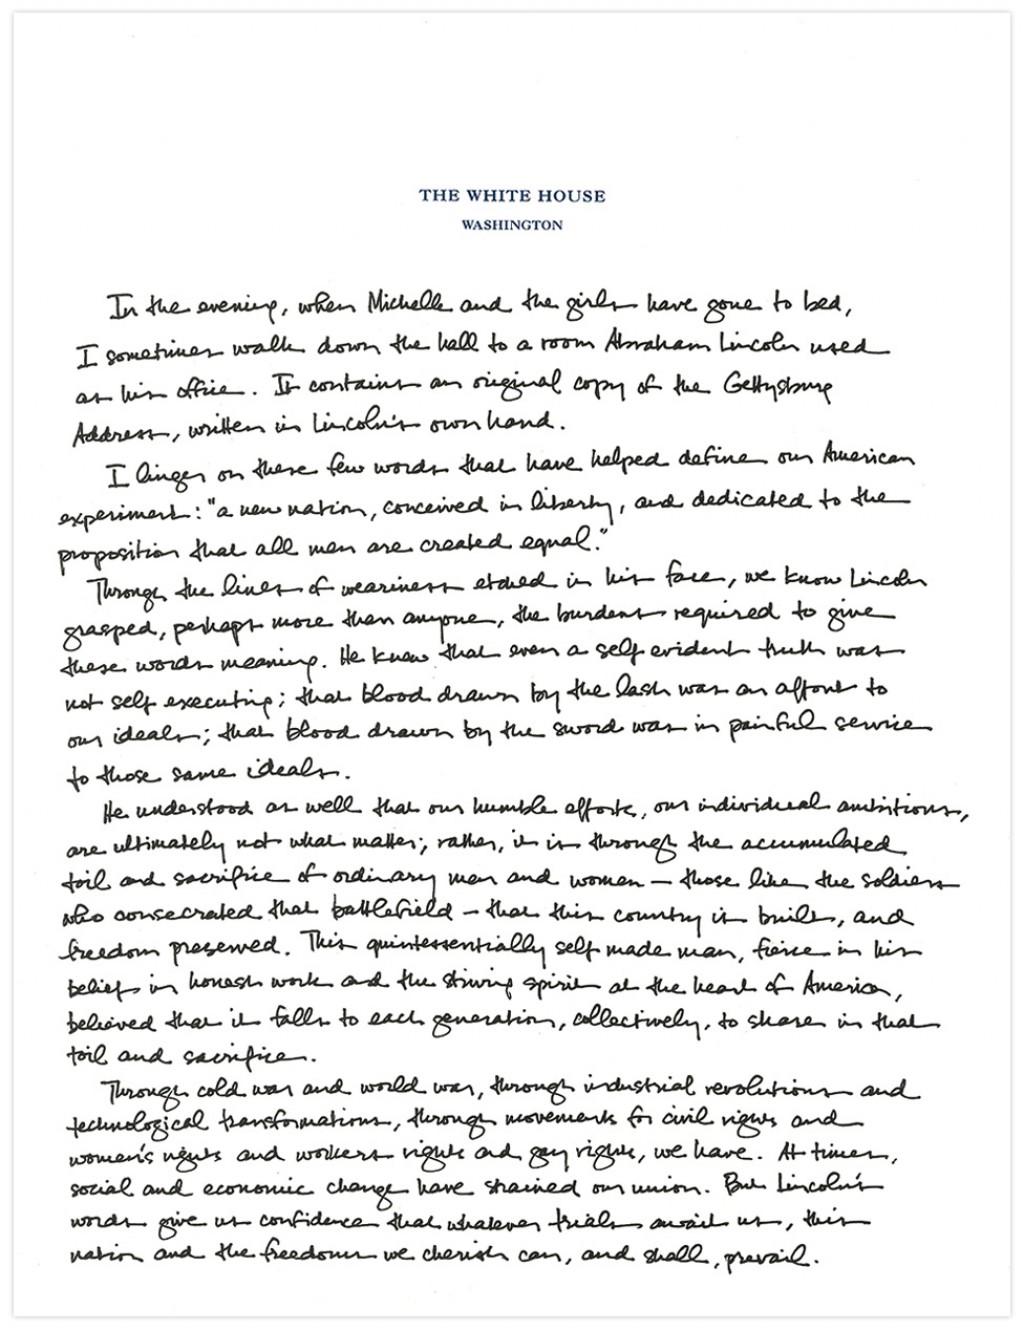 009 Potus Gettysburg Web 2013 Essay On Handwriting Fearsome Short Importance Of Good In Hindi Gujarati Large